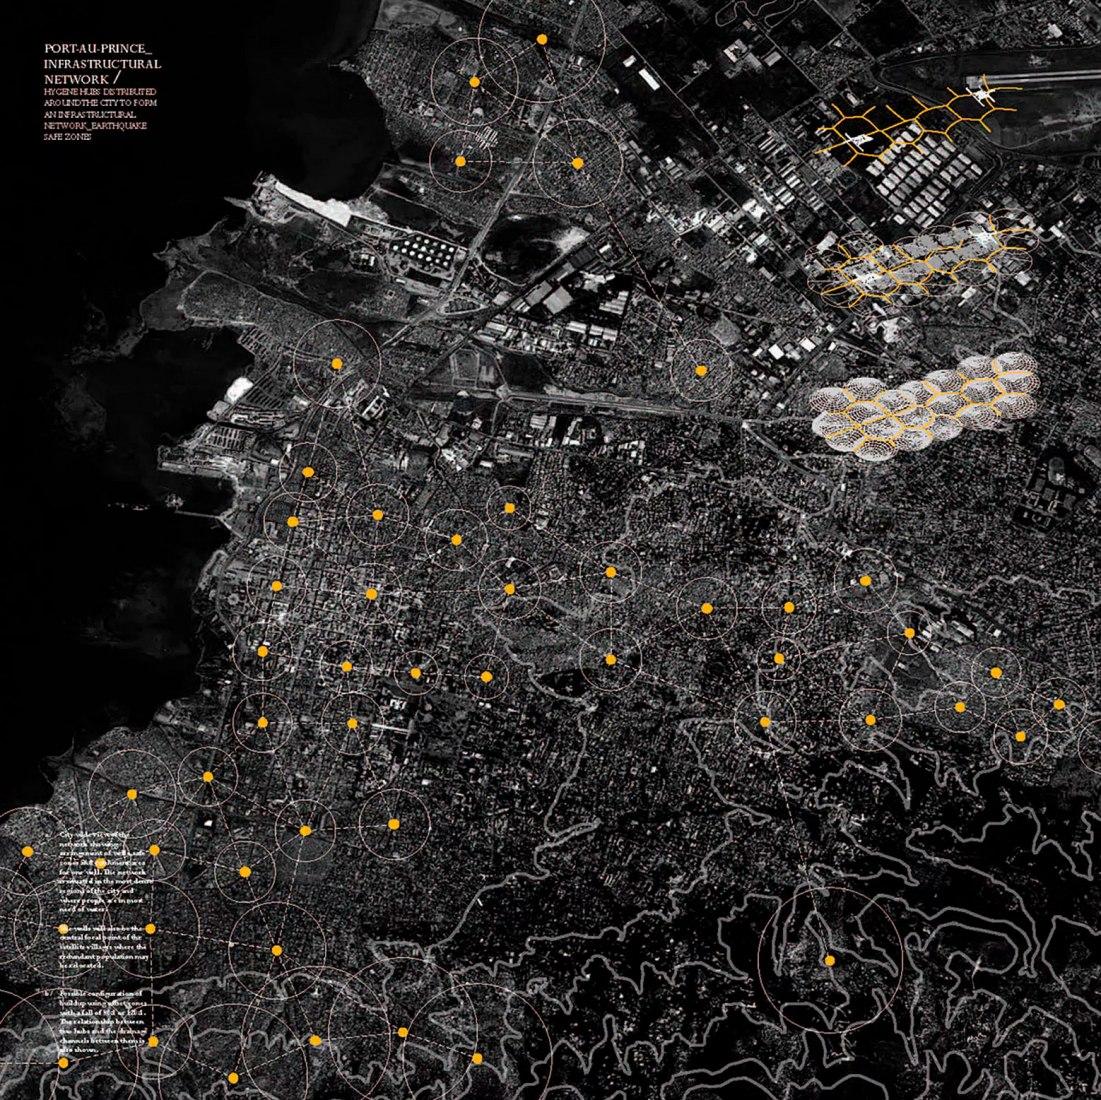 Potential hub distribution throughout metropolitan Port-au-Prince